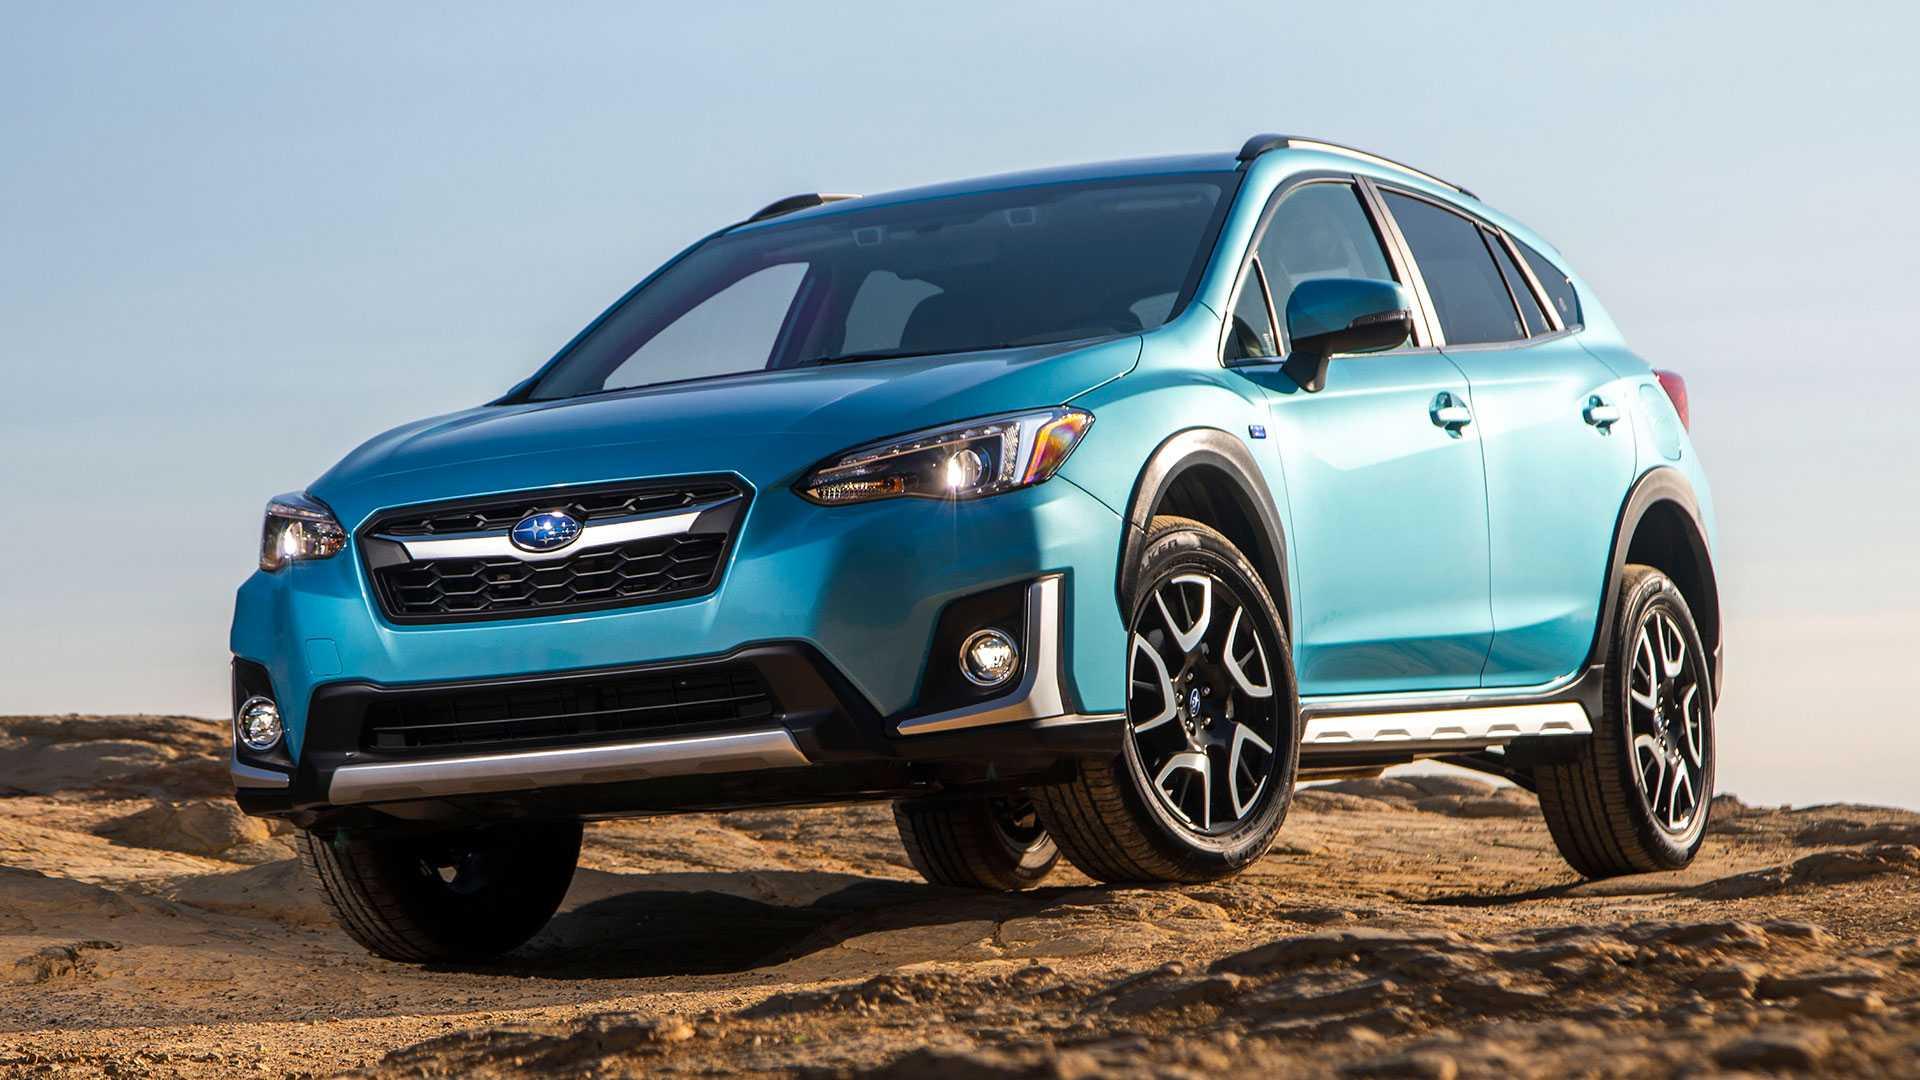 Subaru Crosstrek price in Nepal